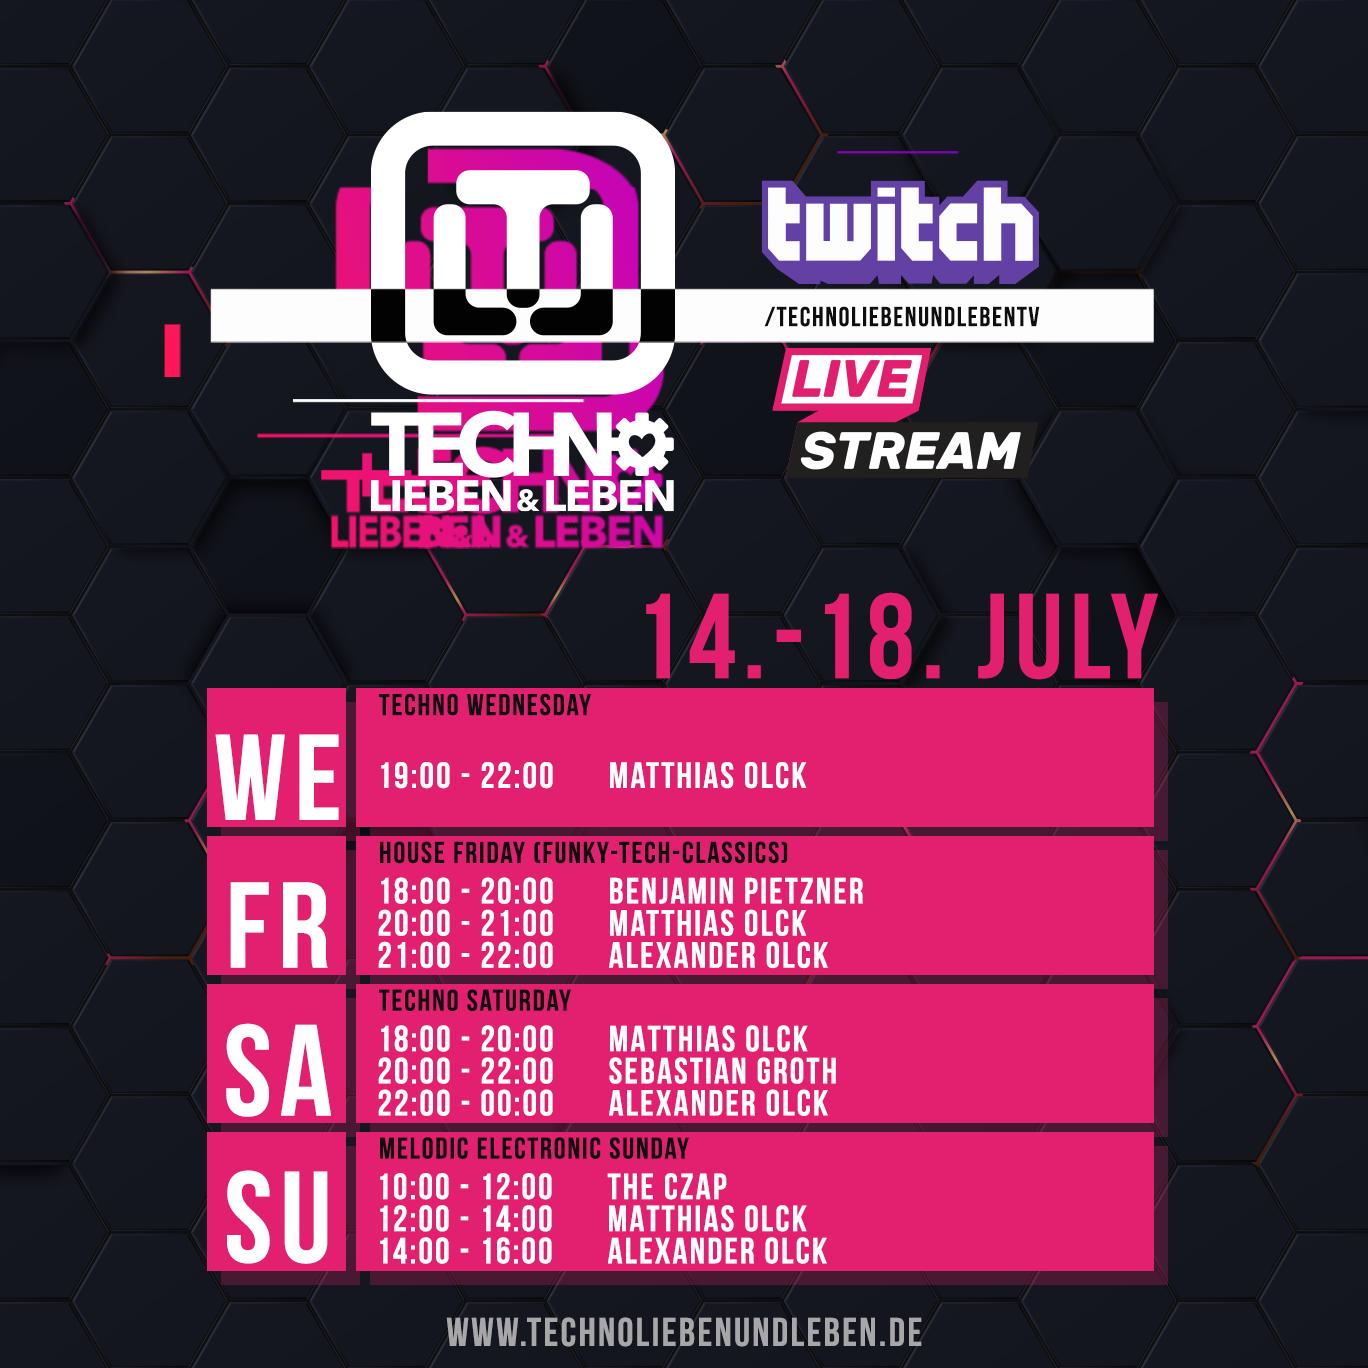 14. - 18. July Twitch Livestream